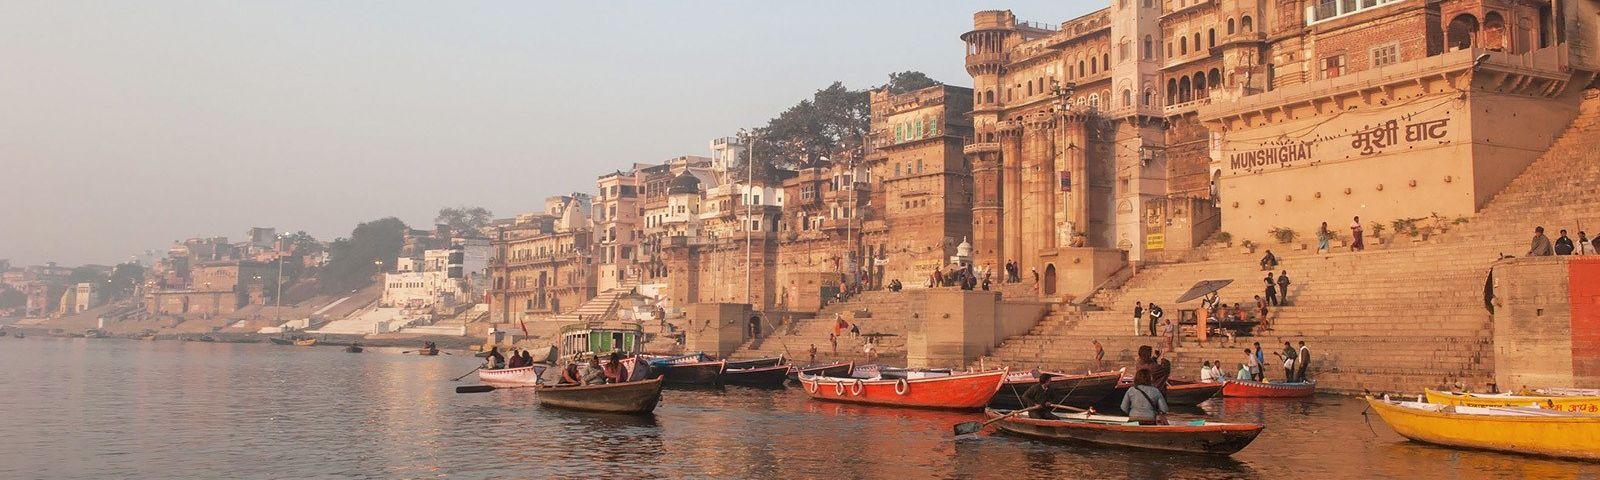 Varanasi India, Ganges river shore